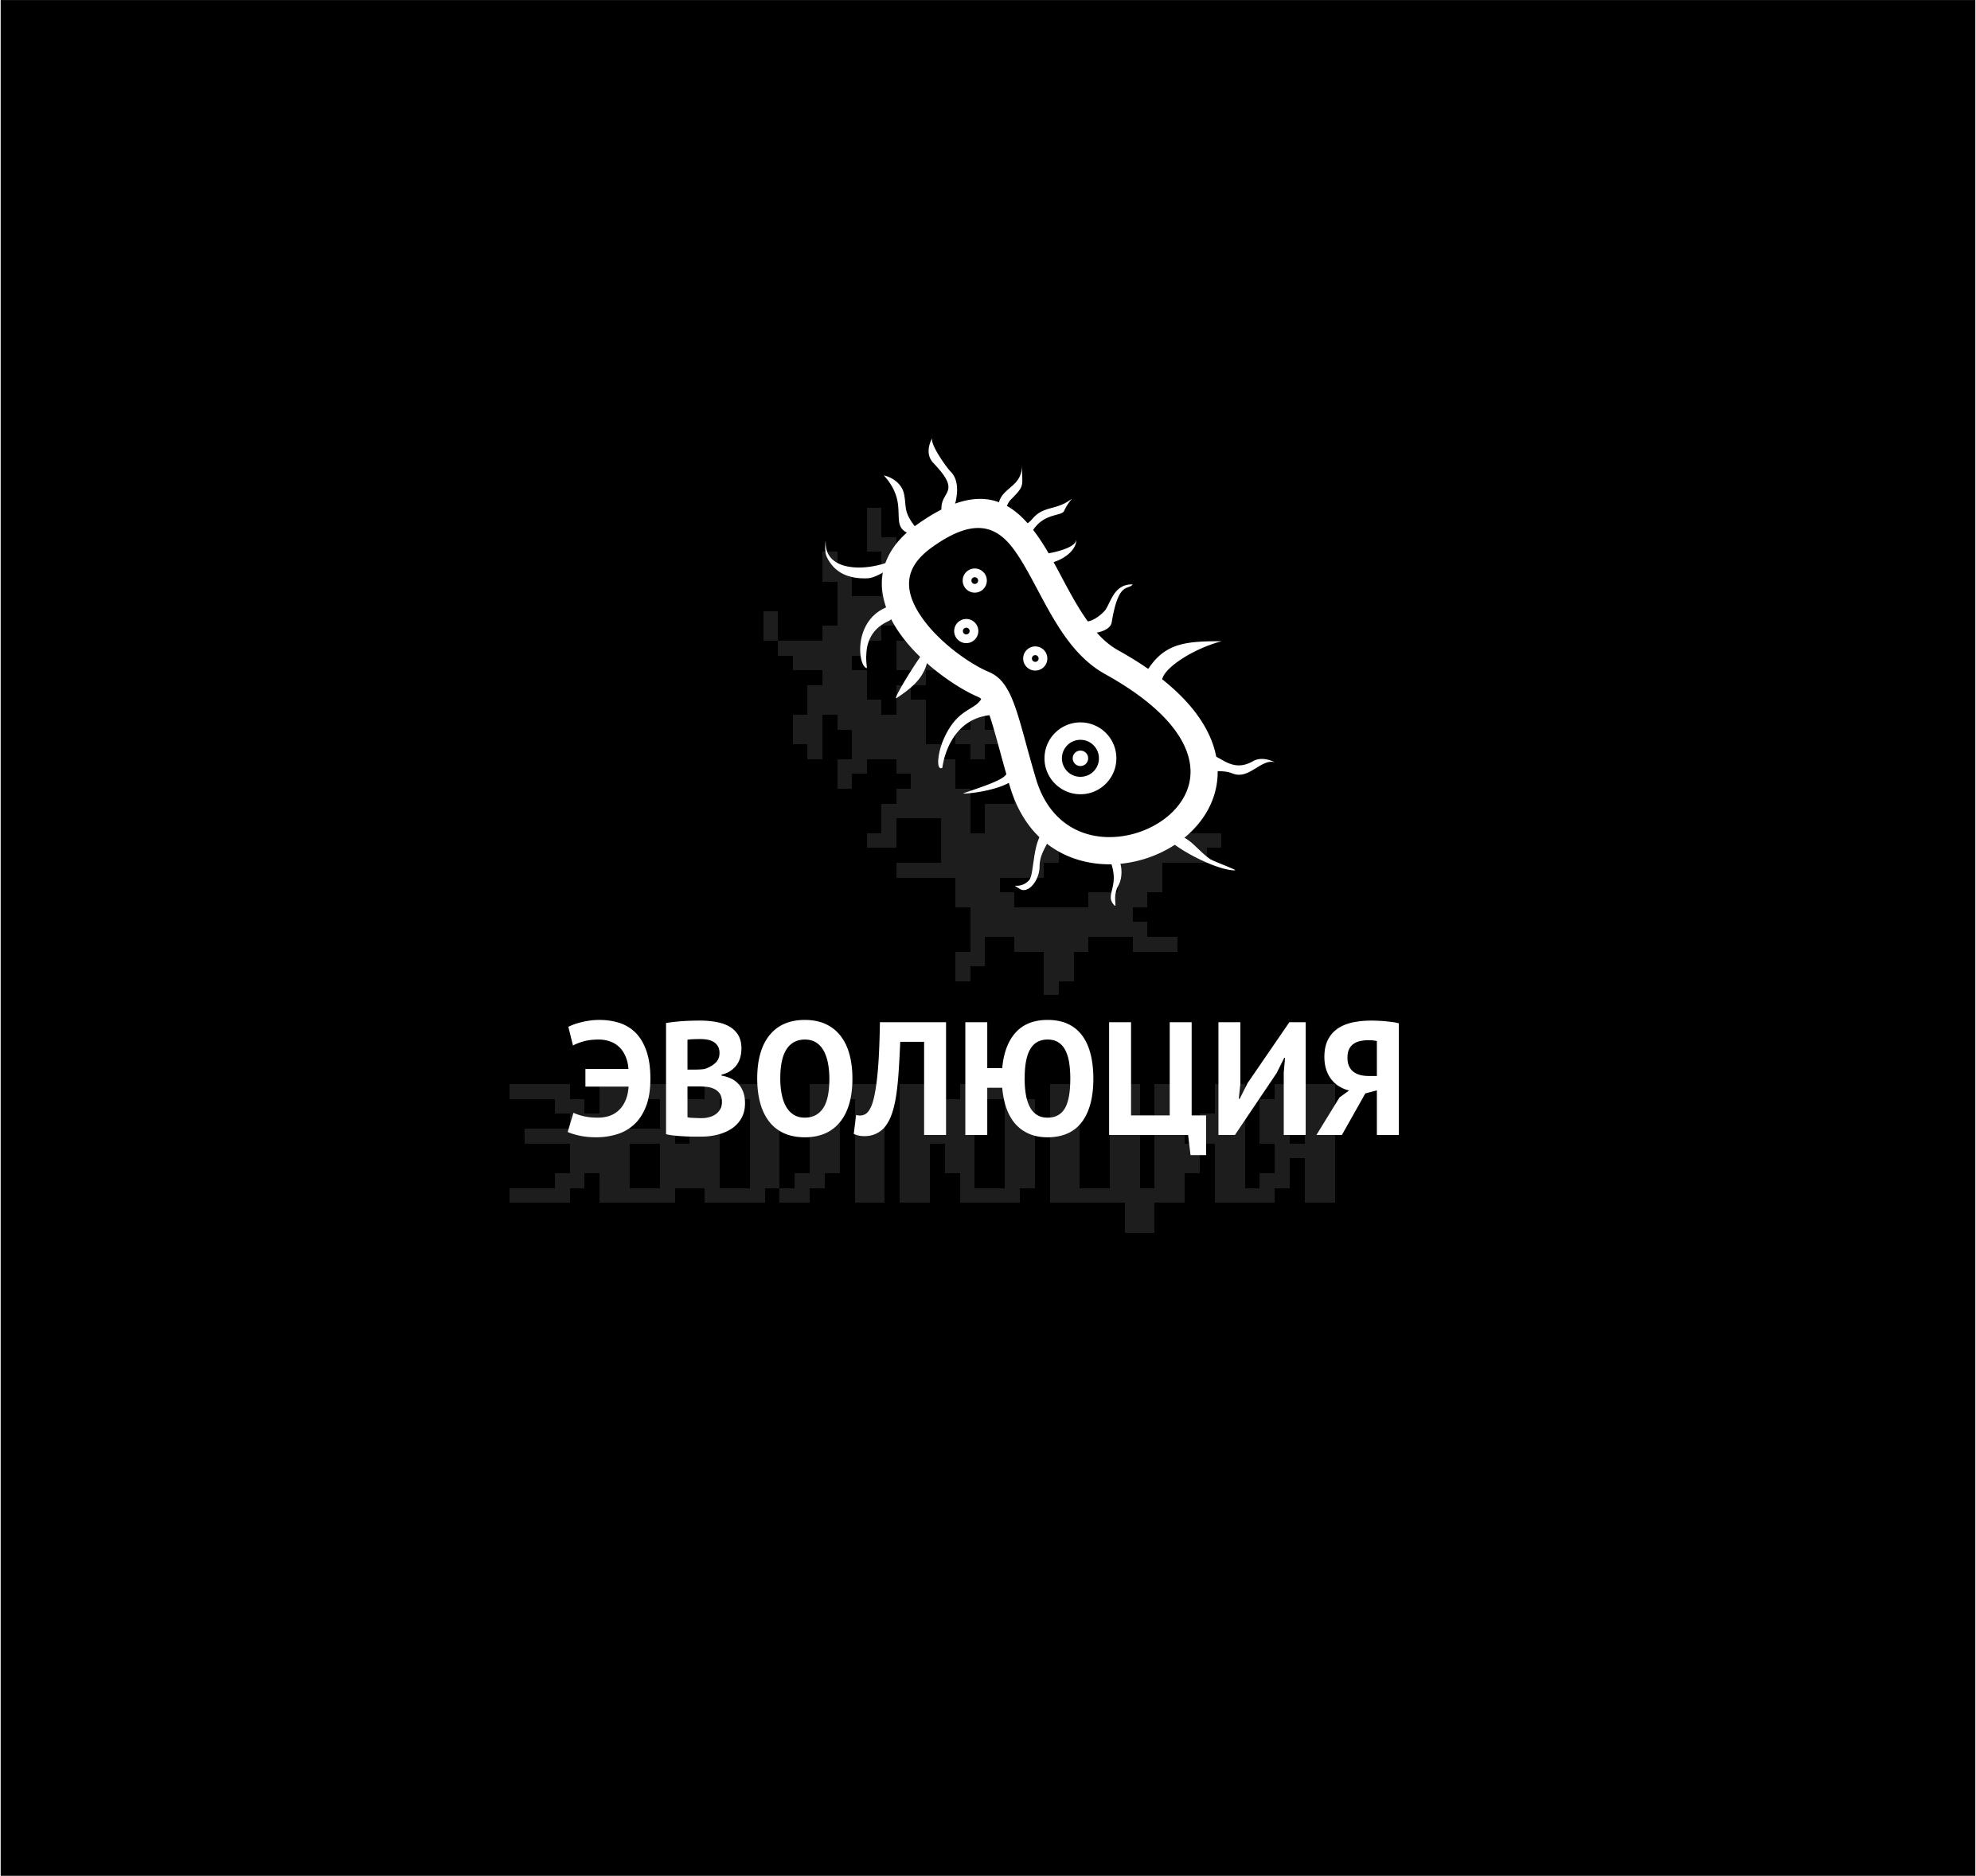 Разработать логотип для Онлайн-школы и сообщества фото f_1775bc7e4c856b11.jpg